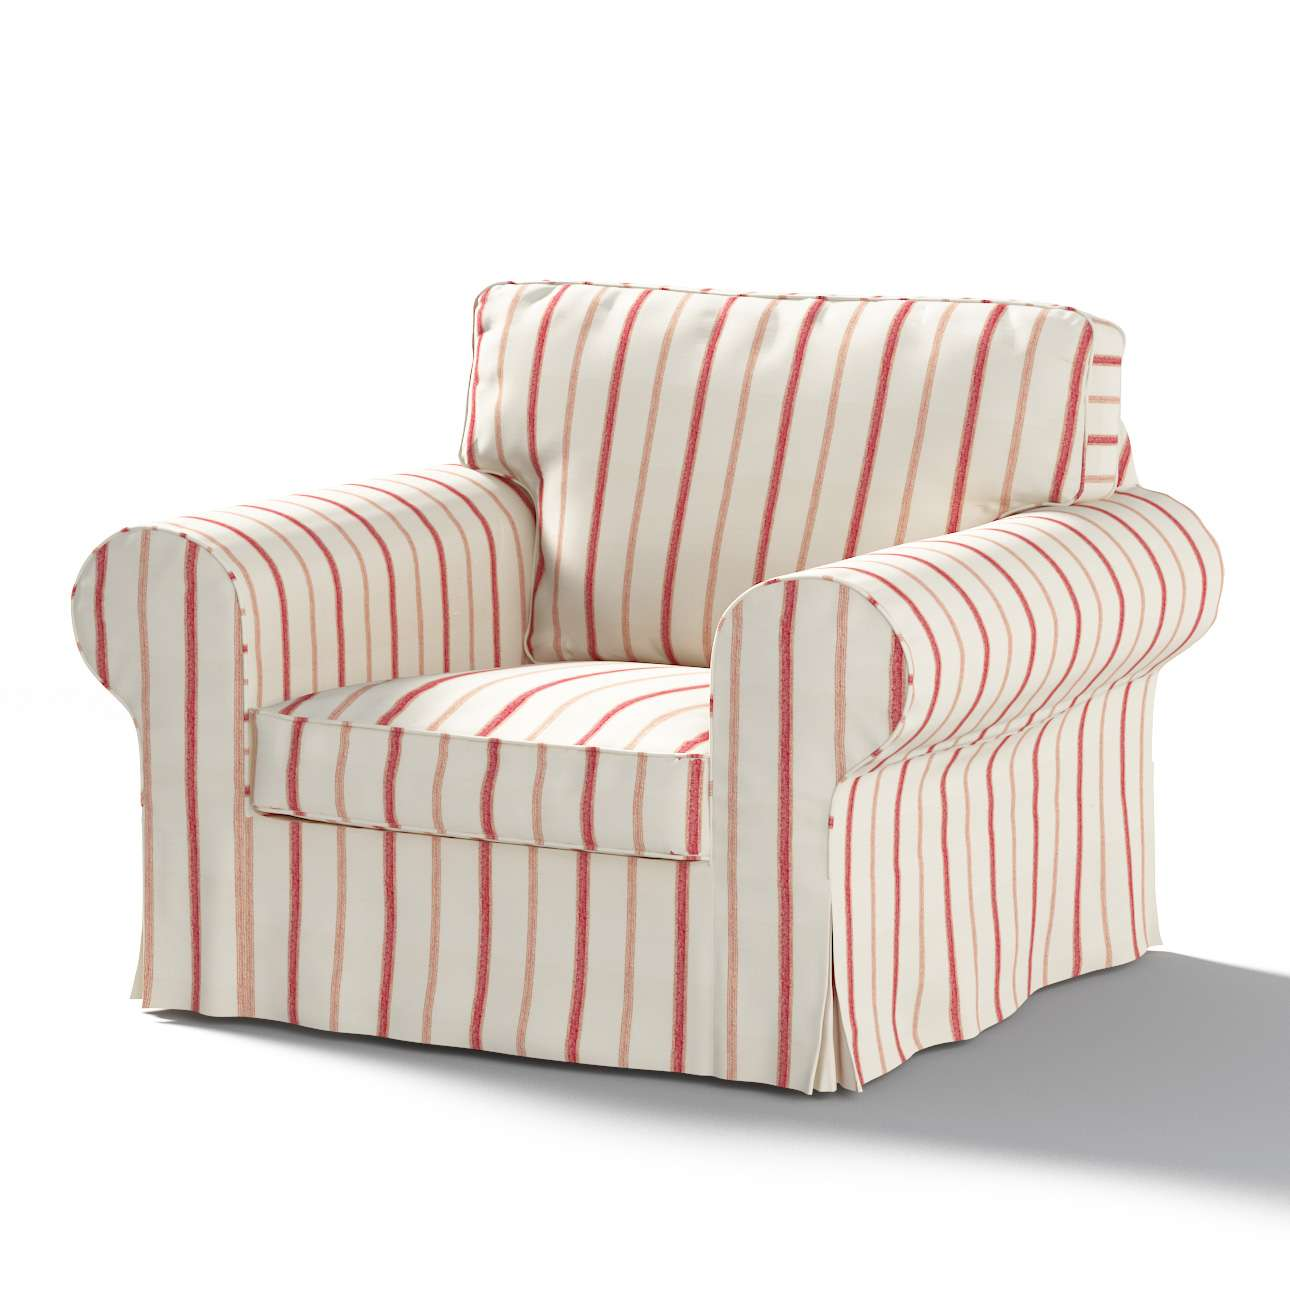 Ektorp Sesselbezug Sesselhusse, Ektorp Sessel von der Kollektion Avinon, Stoff: 129-15